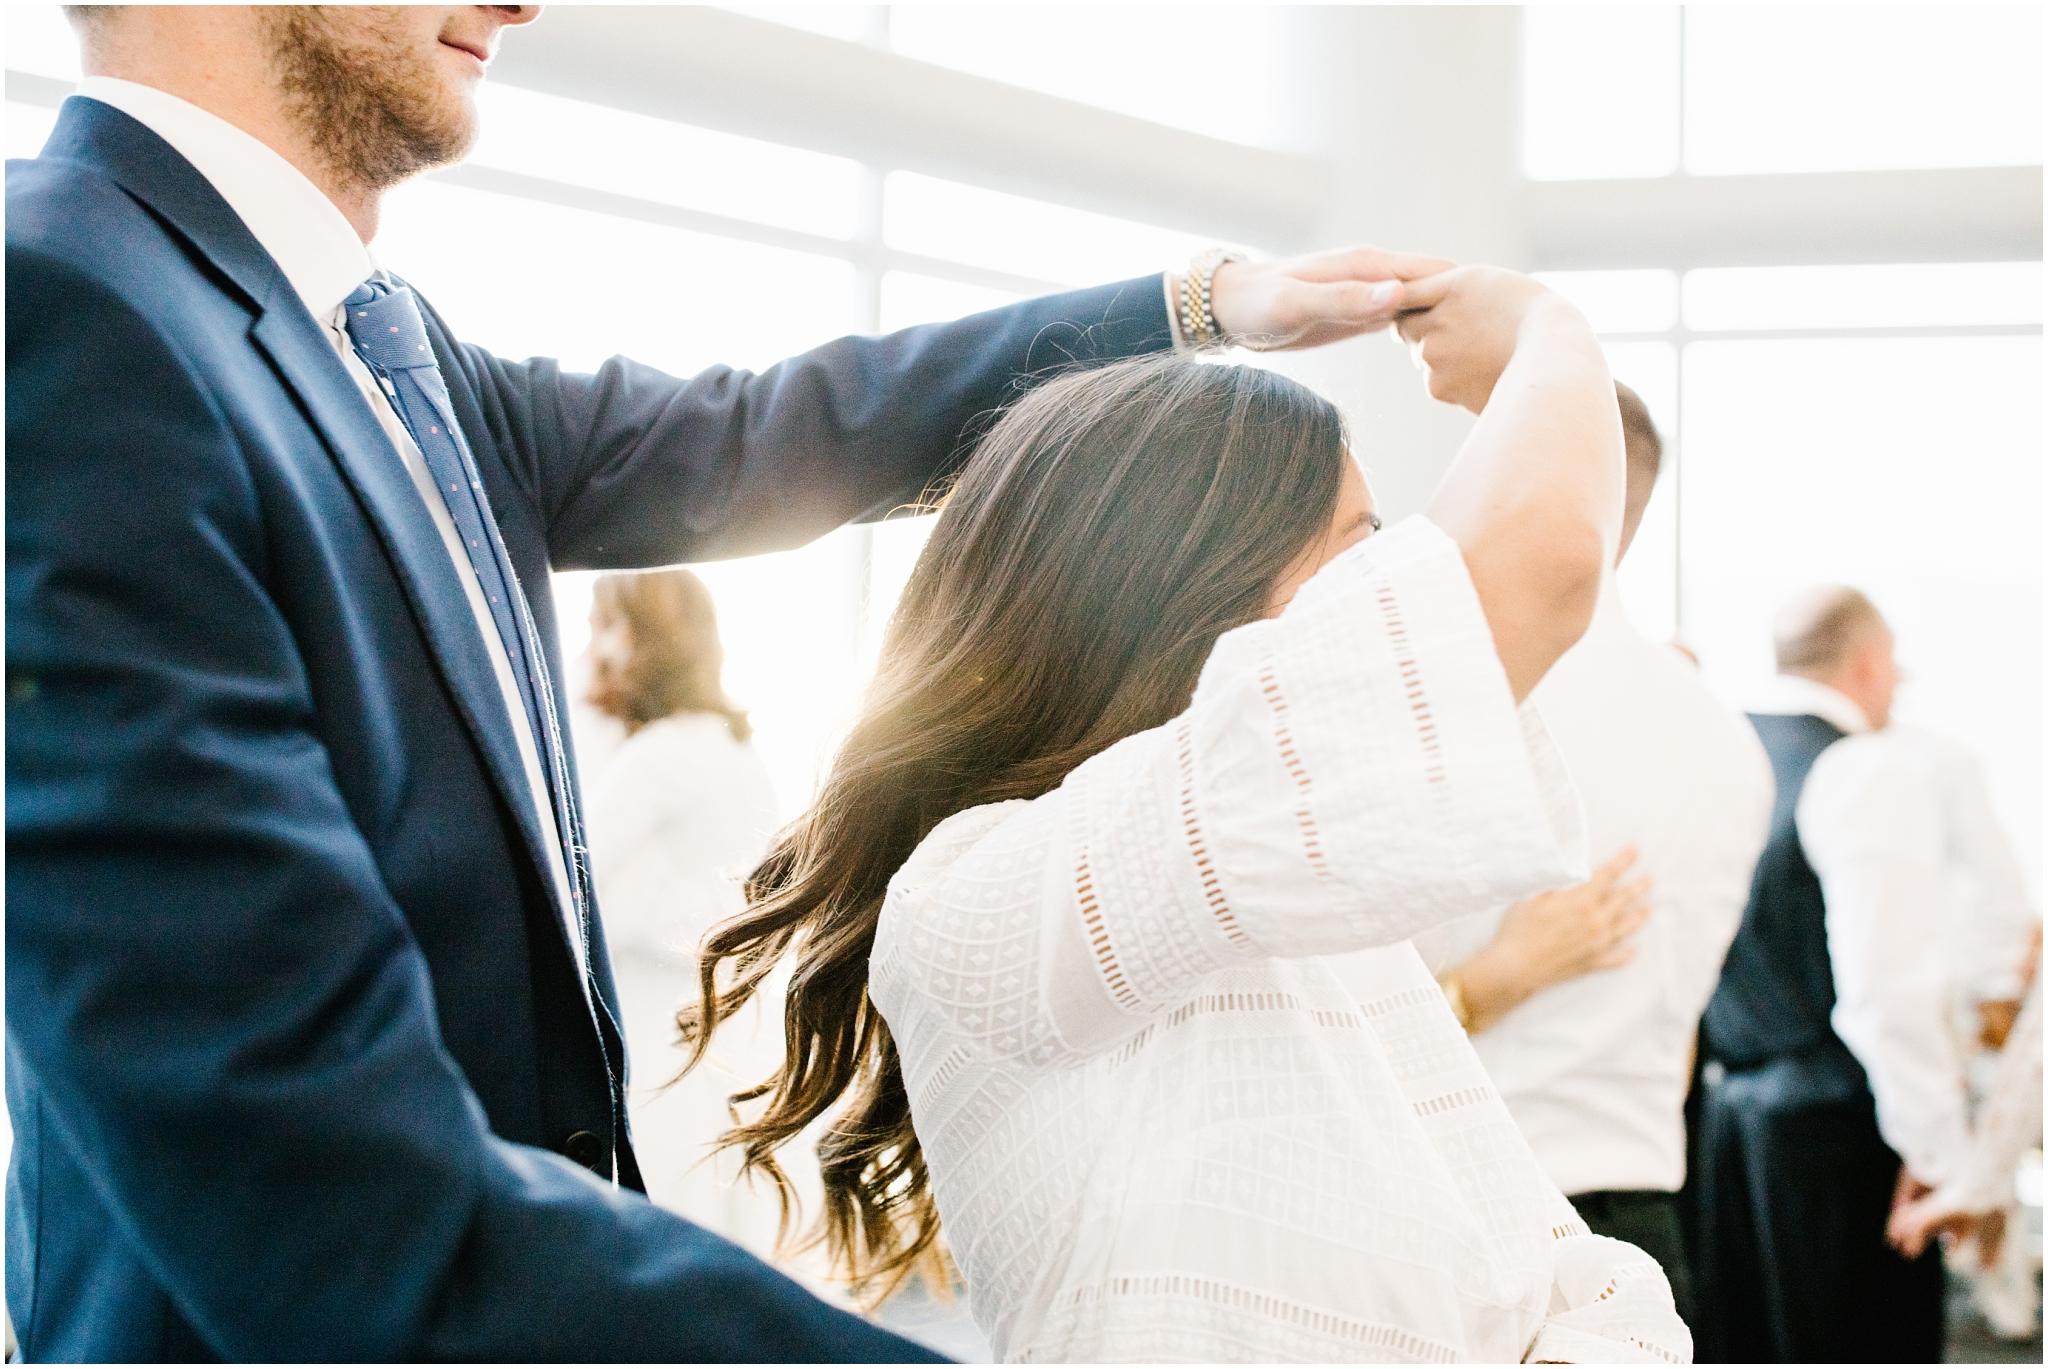 CherylandTyler-617_Lizzie-B-Imagery-Utah-Wedding-Photographer-Salt-Lake-City-Temple-Wells-Fargo-Building-Reception.jpg